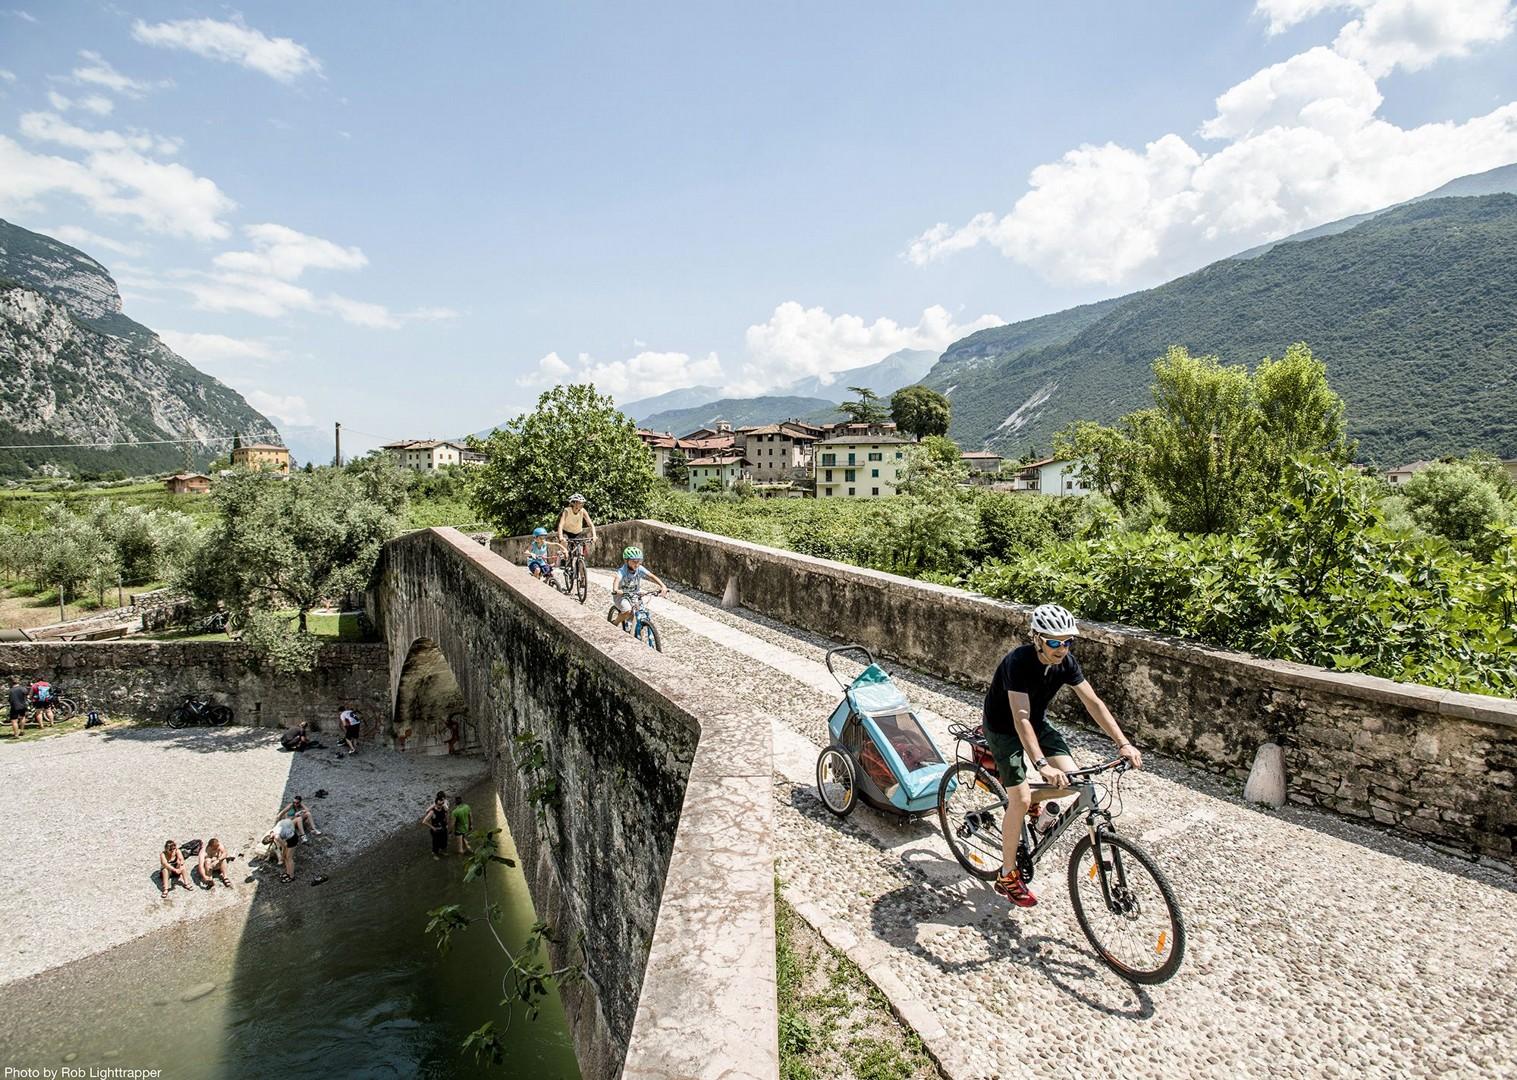 bridge-italy-lake-garda-self-guided-family-holiday.jpg - Italy - Lake Garda Explorer - Self-Guided Family Cycling Holiday - Italia Leisure and Family Cycling